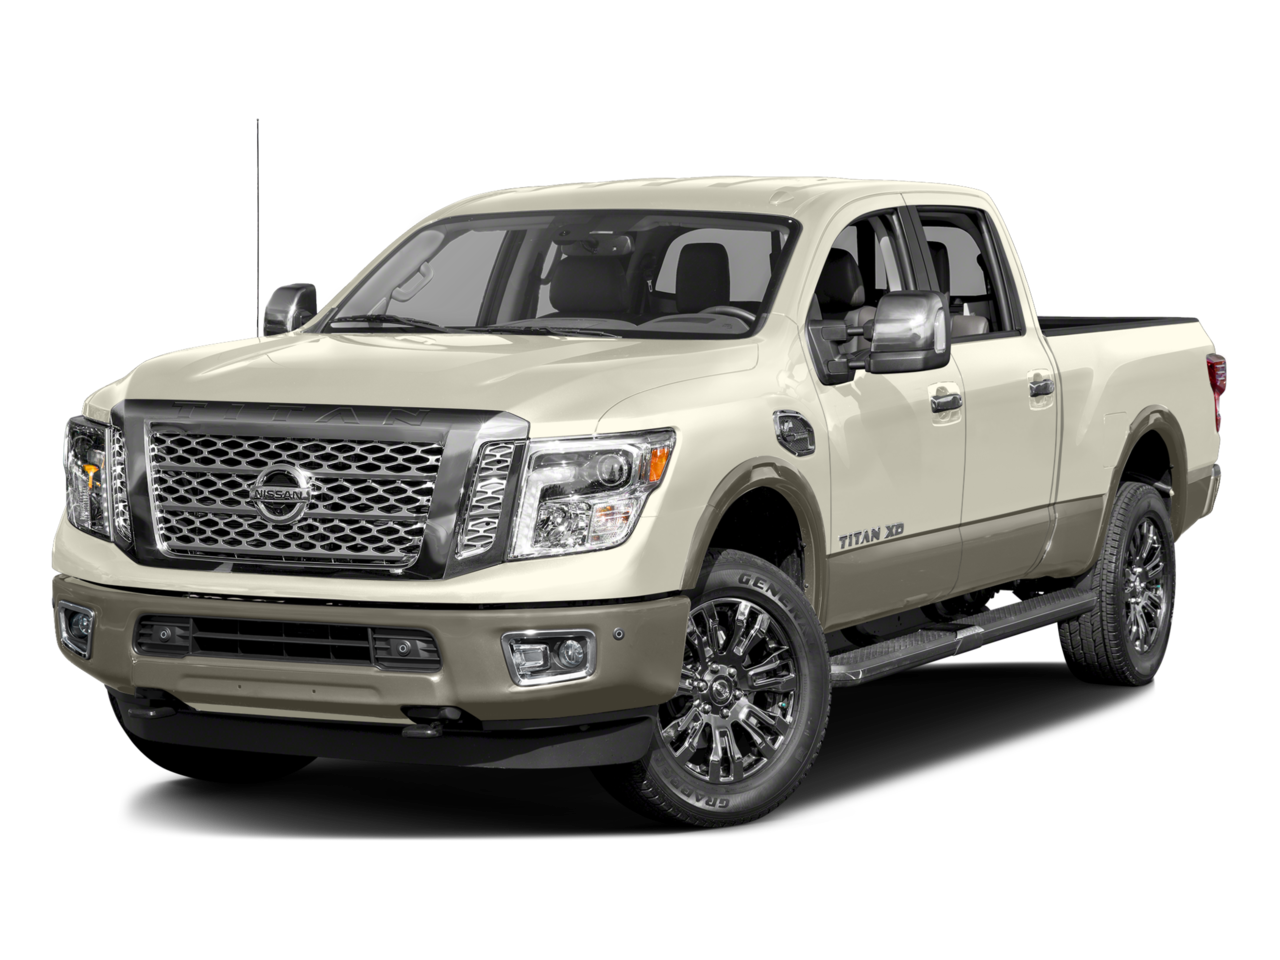 2018 nissan titan clipart png stock 2017 Nissan Titan XD Pickup truck 2018 Nissan Titan XD Platinum ... png stock